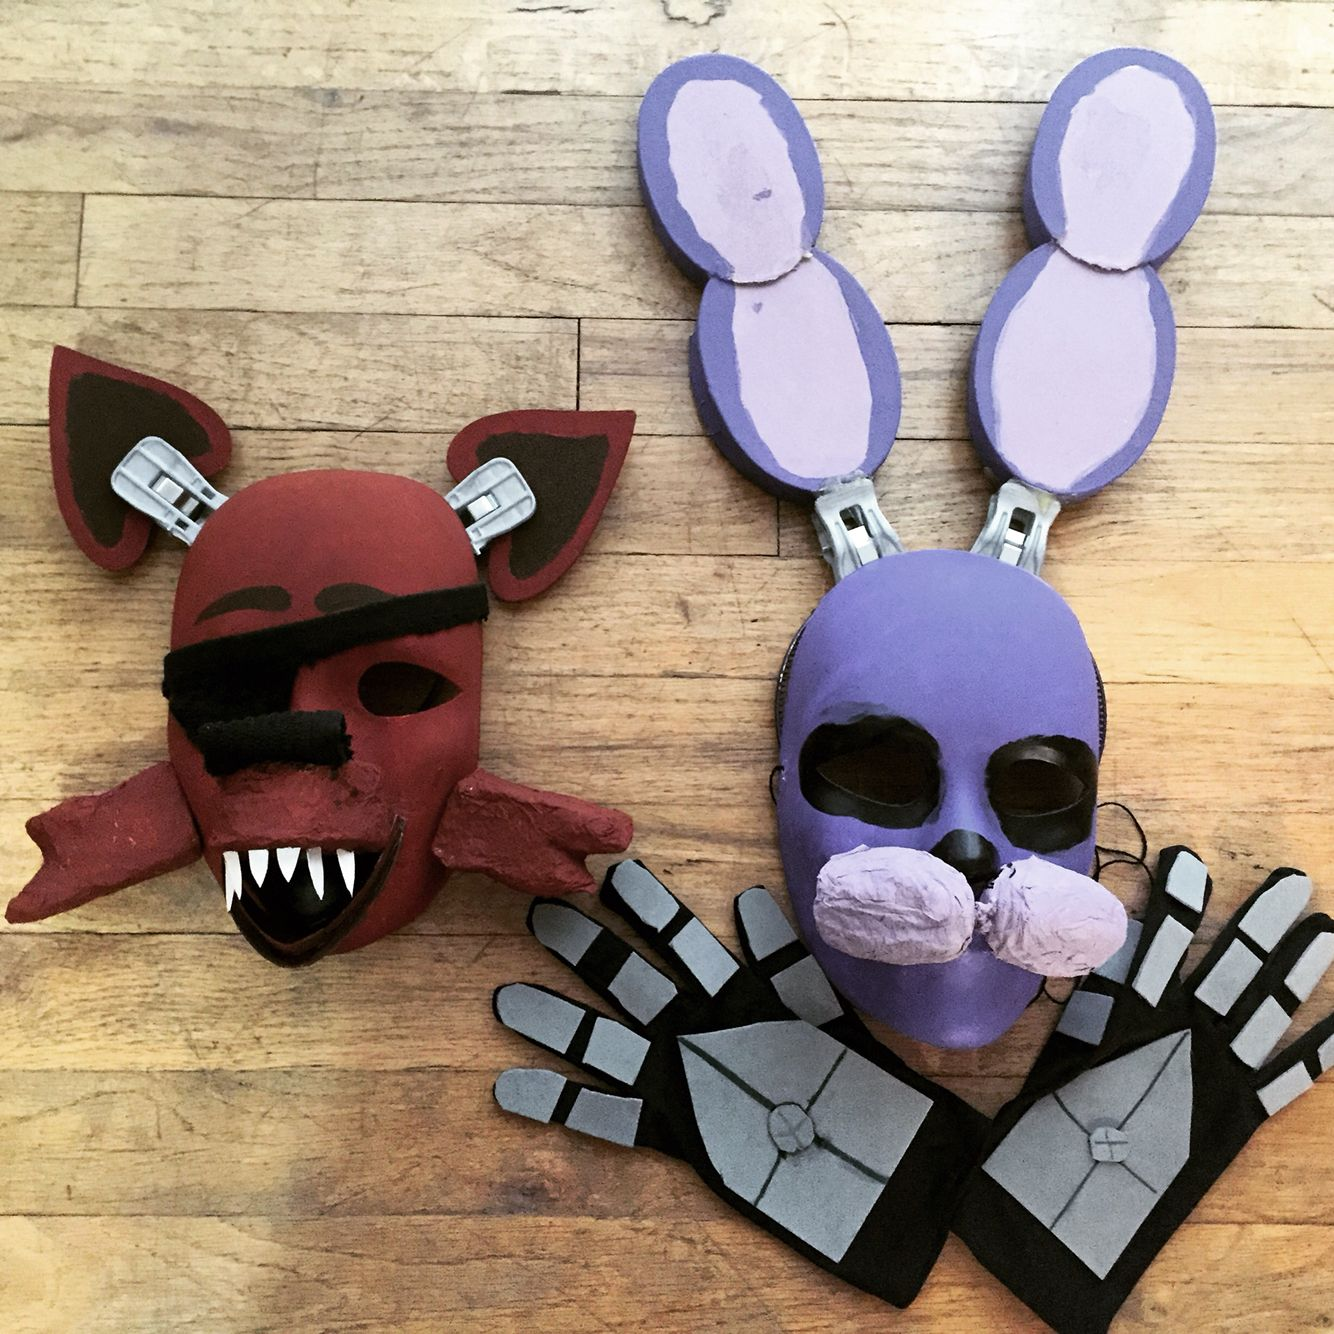 F fnaf bonnie costume for sale - Foxy And Bonnie Painted Plain Masks Glued And Painted Foam Cut Outs Cardboard Ears Hot Glue Super Glue Fnaf Costume